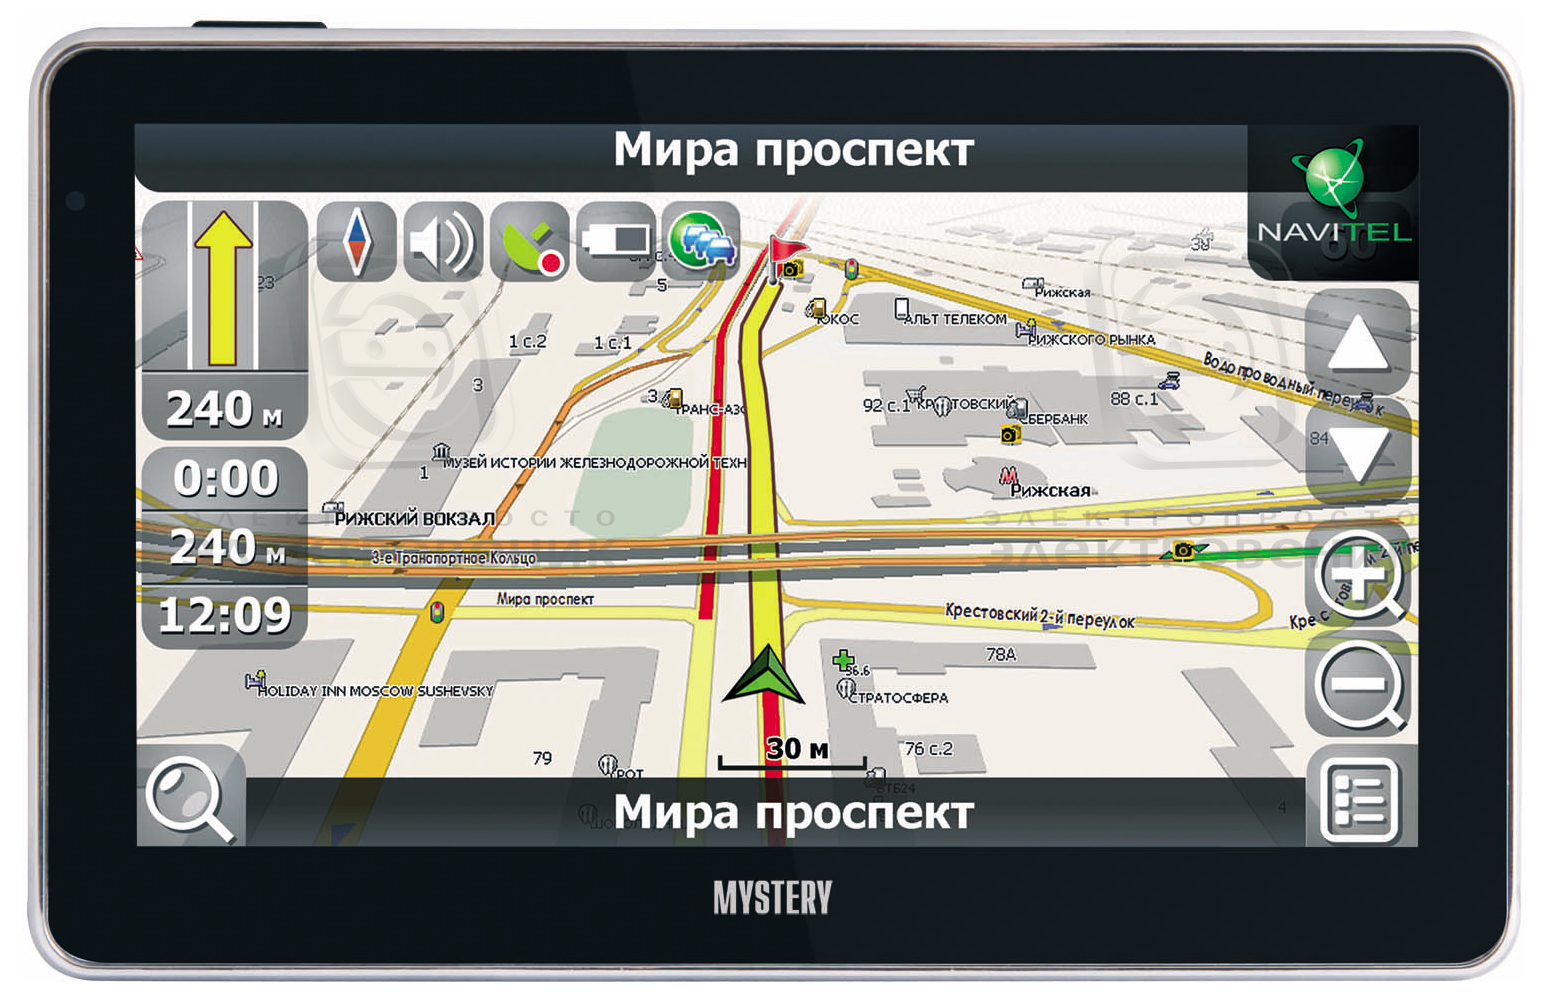 gps навигаторы эхолоты карты GPS карплоттеры рации